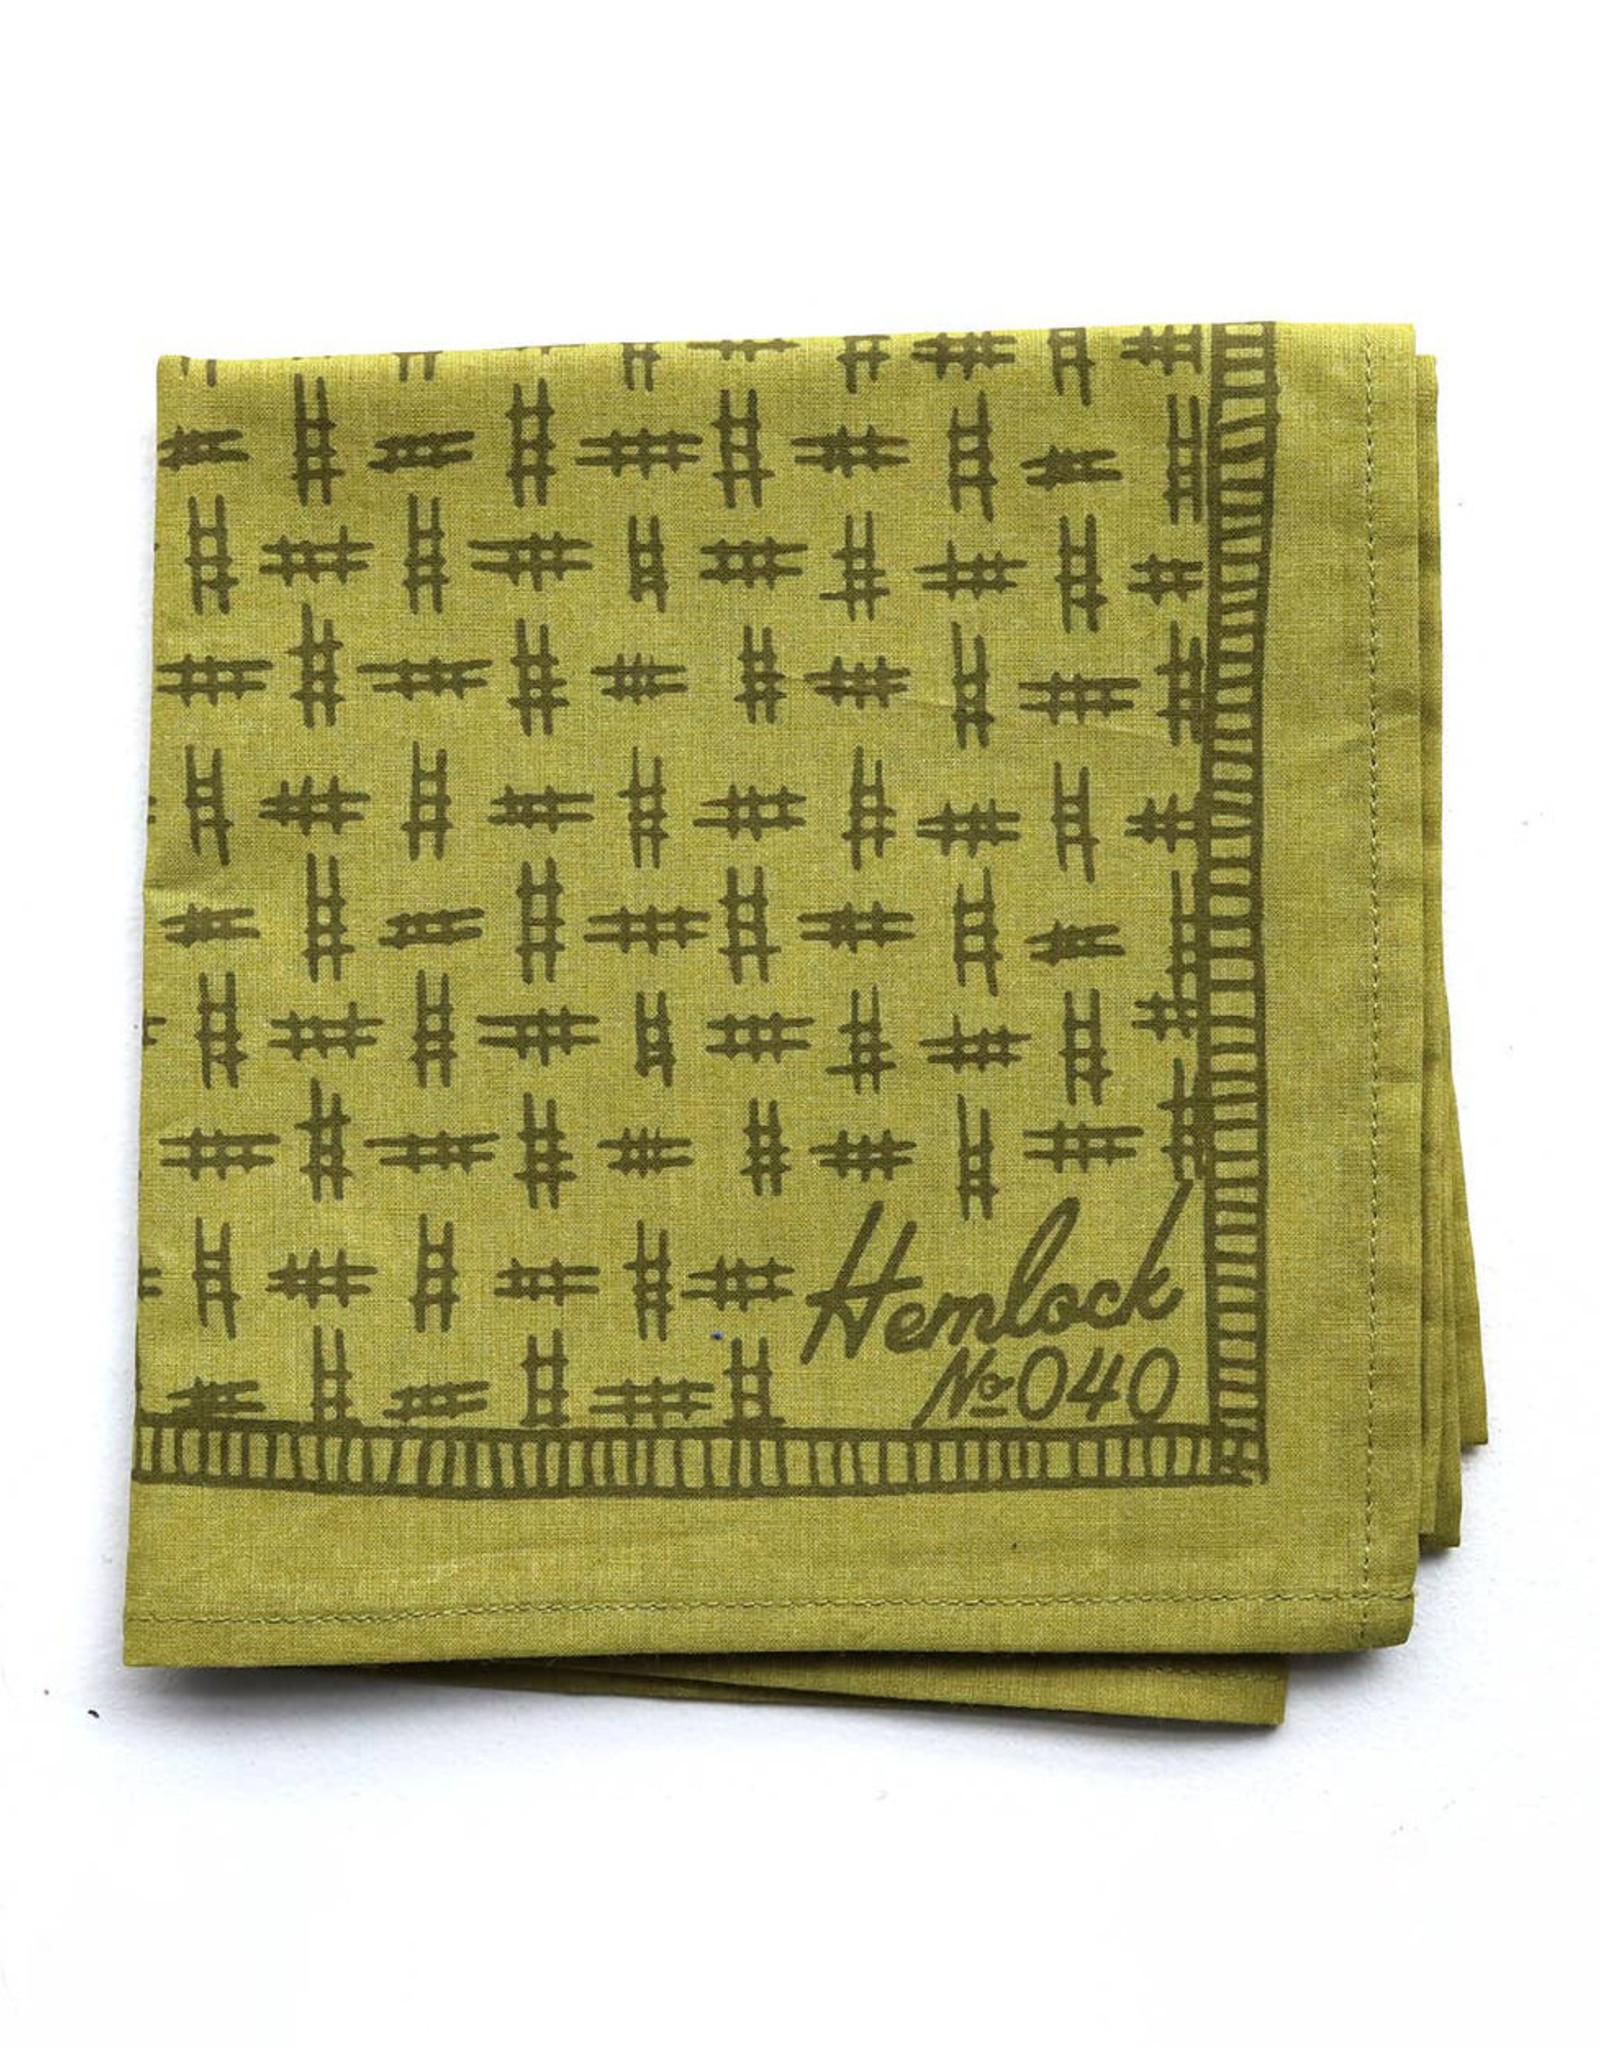 Hemlock No. 040 Hunter Bandana